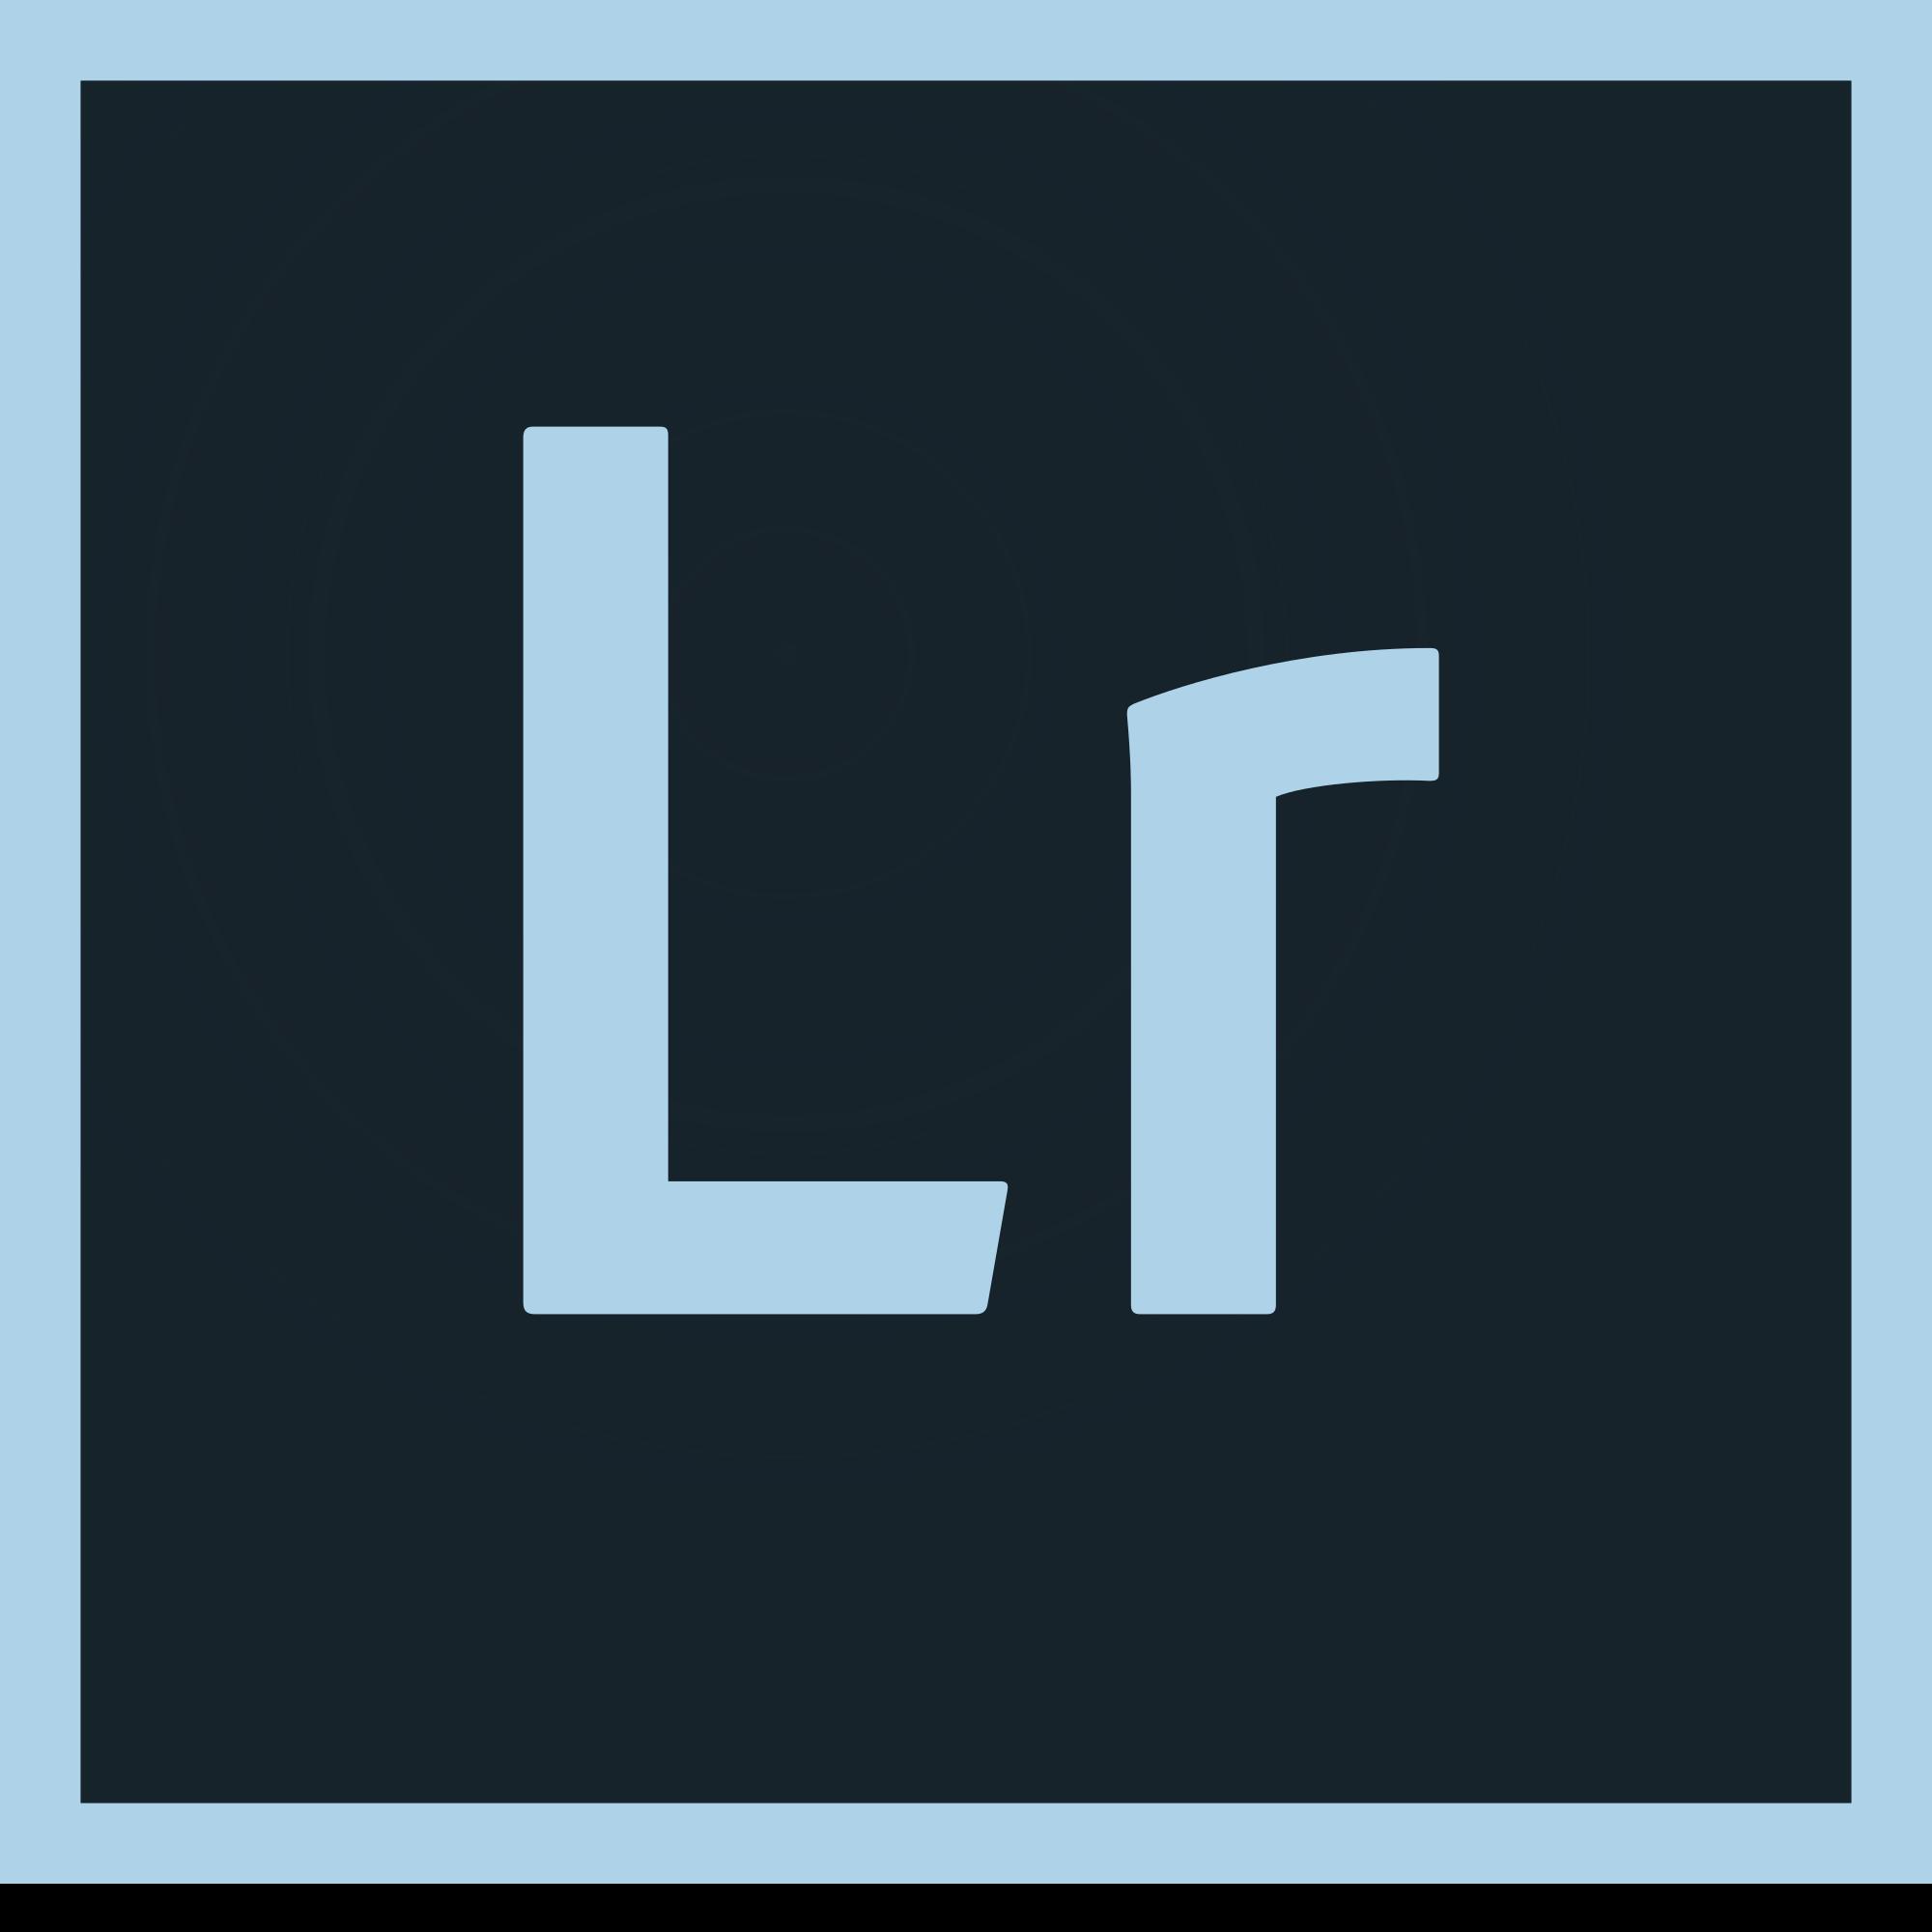 Adobe_Photoshop_Lightroom_CC_icon.png